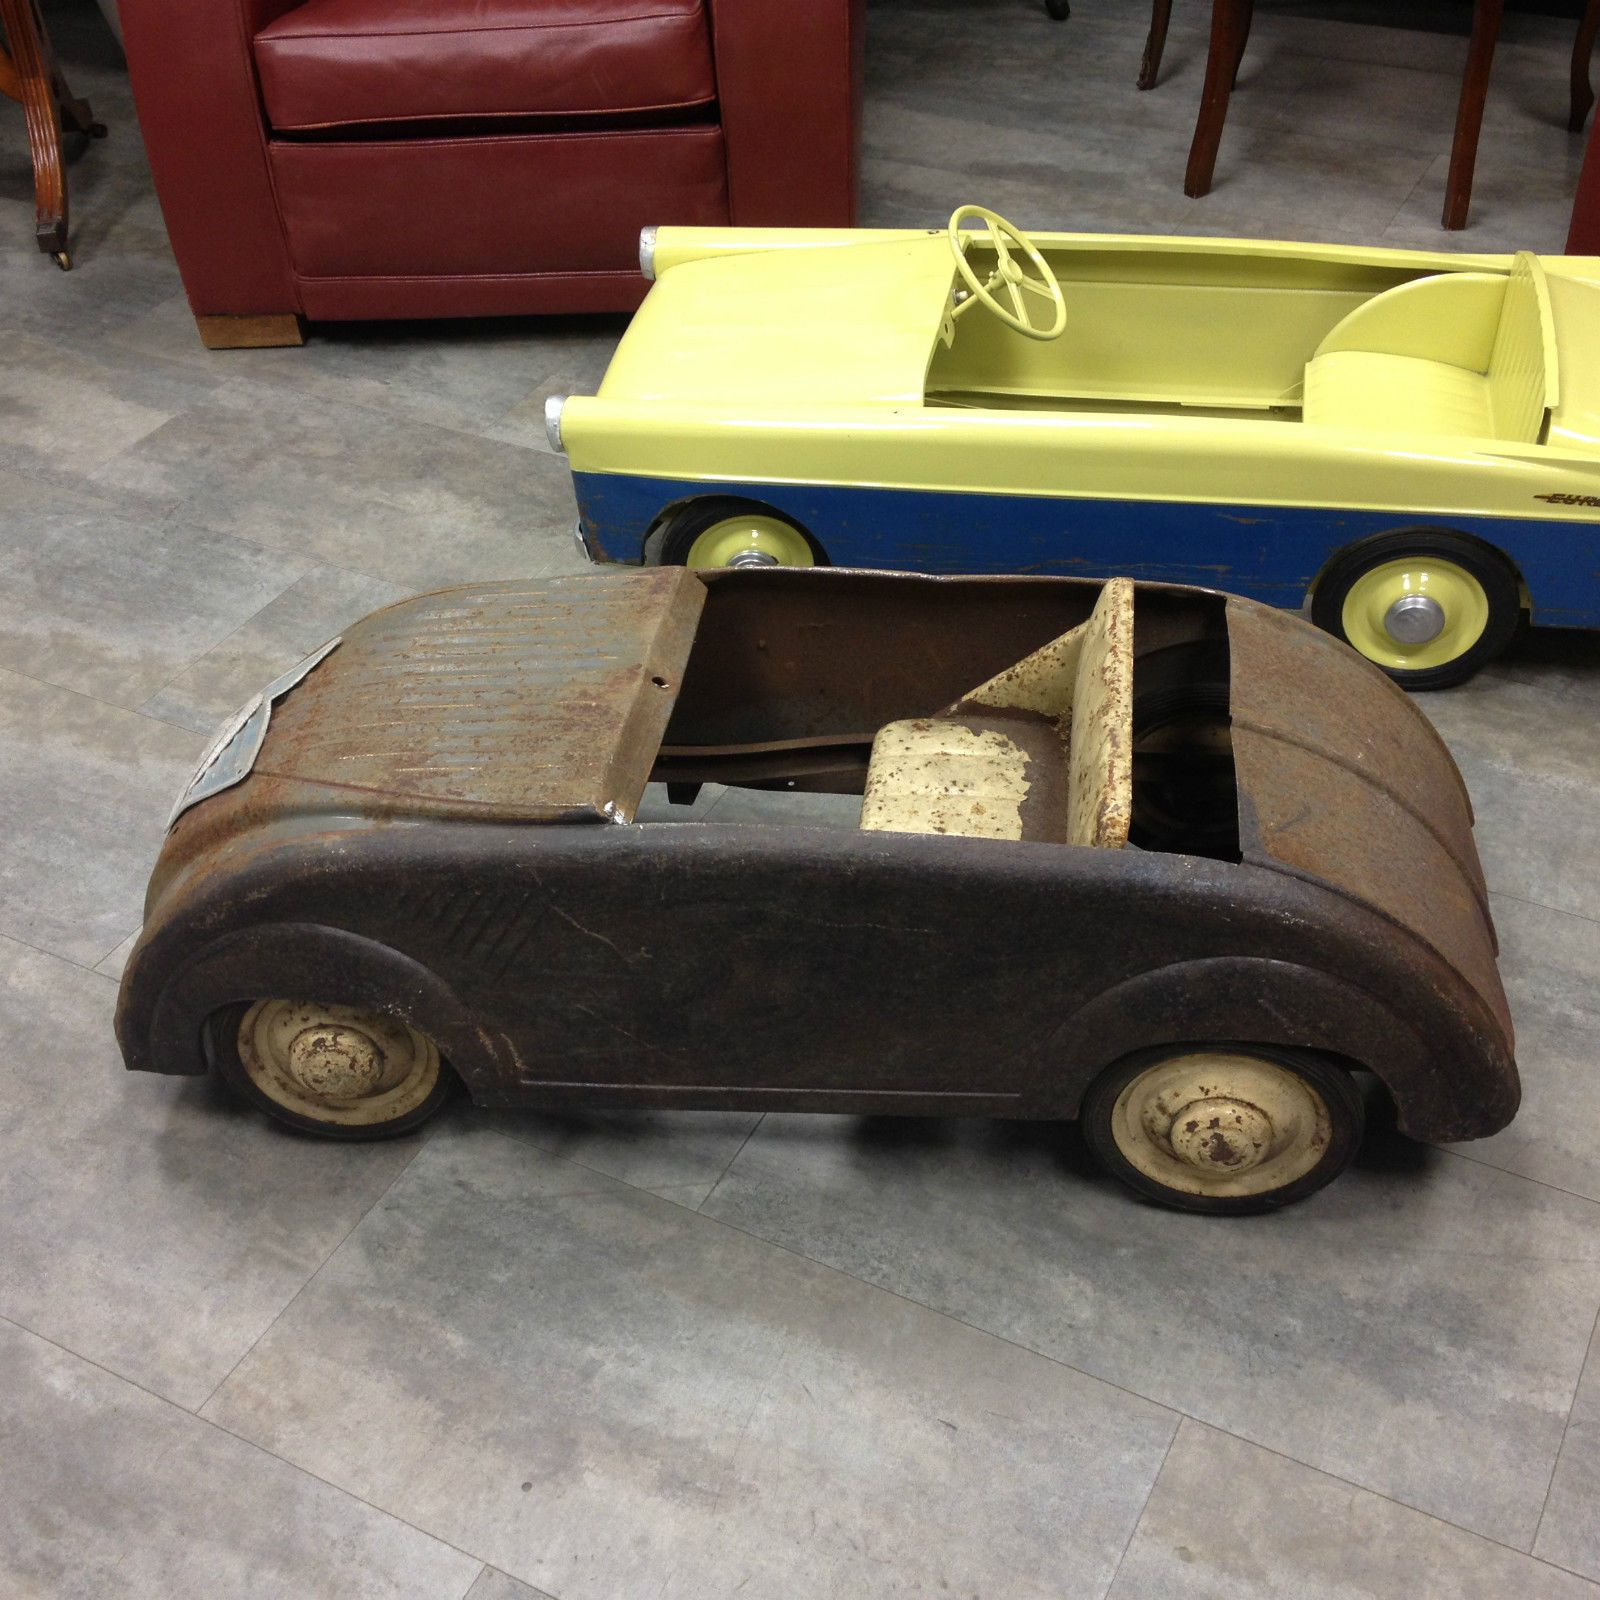 voiture p dales pedal car 2 cv citroen ann e 1955 marque mfa idem mg eureka citroen. Black Bedroom Furniture Sets. Home Design Ideas